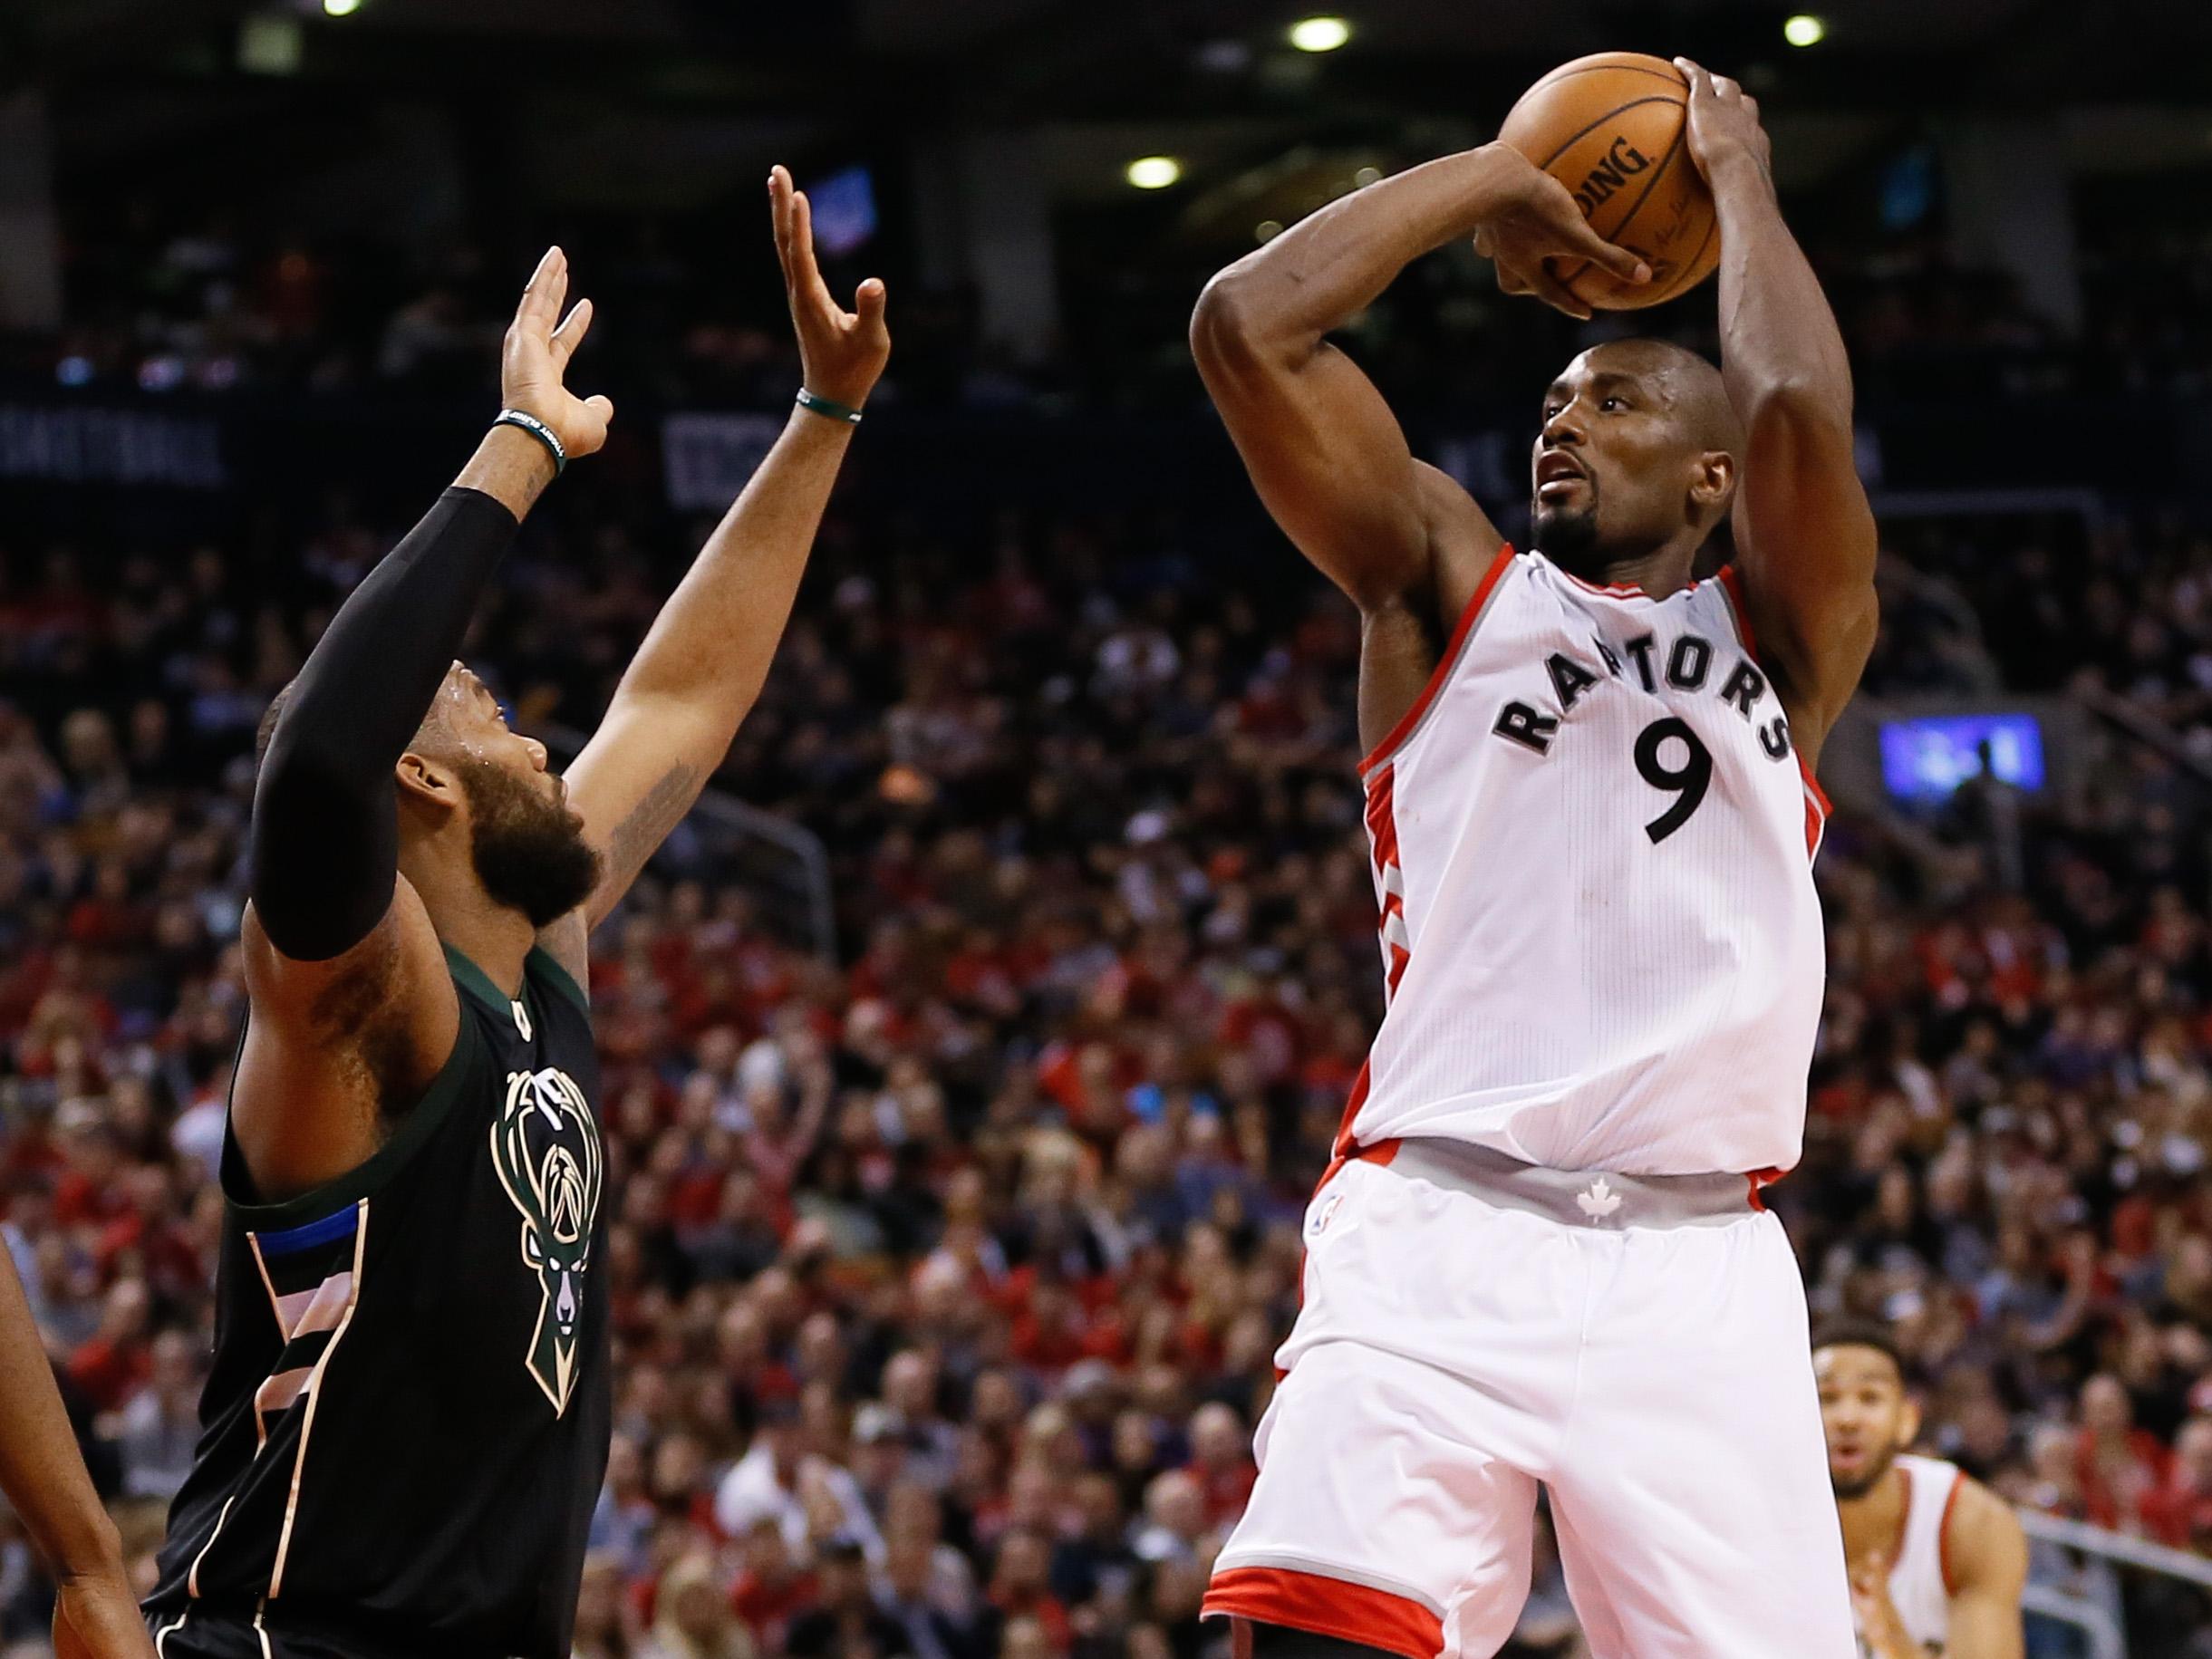 The Toronto Raptors should not re-sign Serge Ibaka